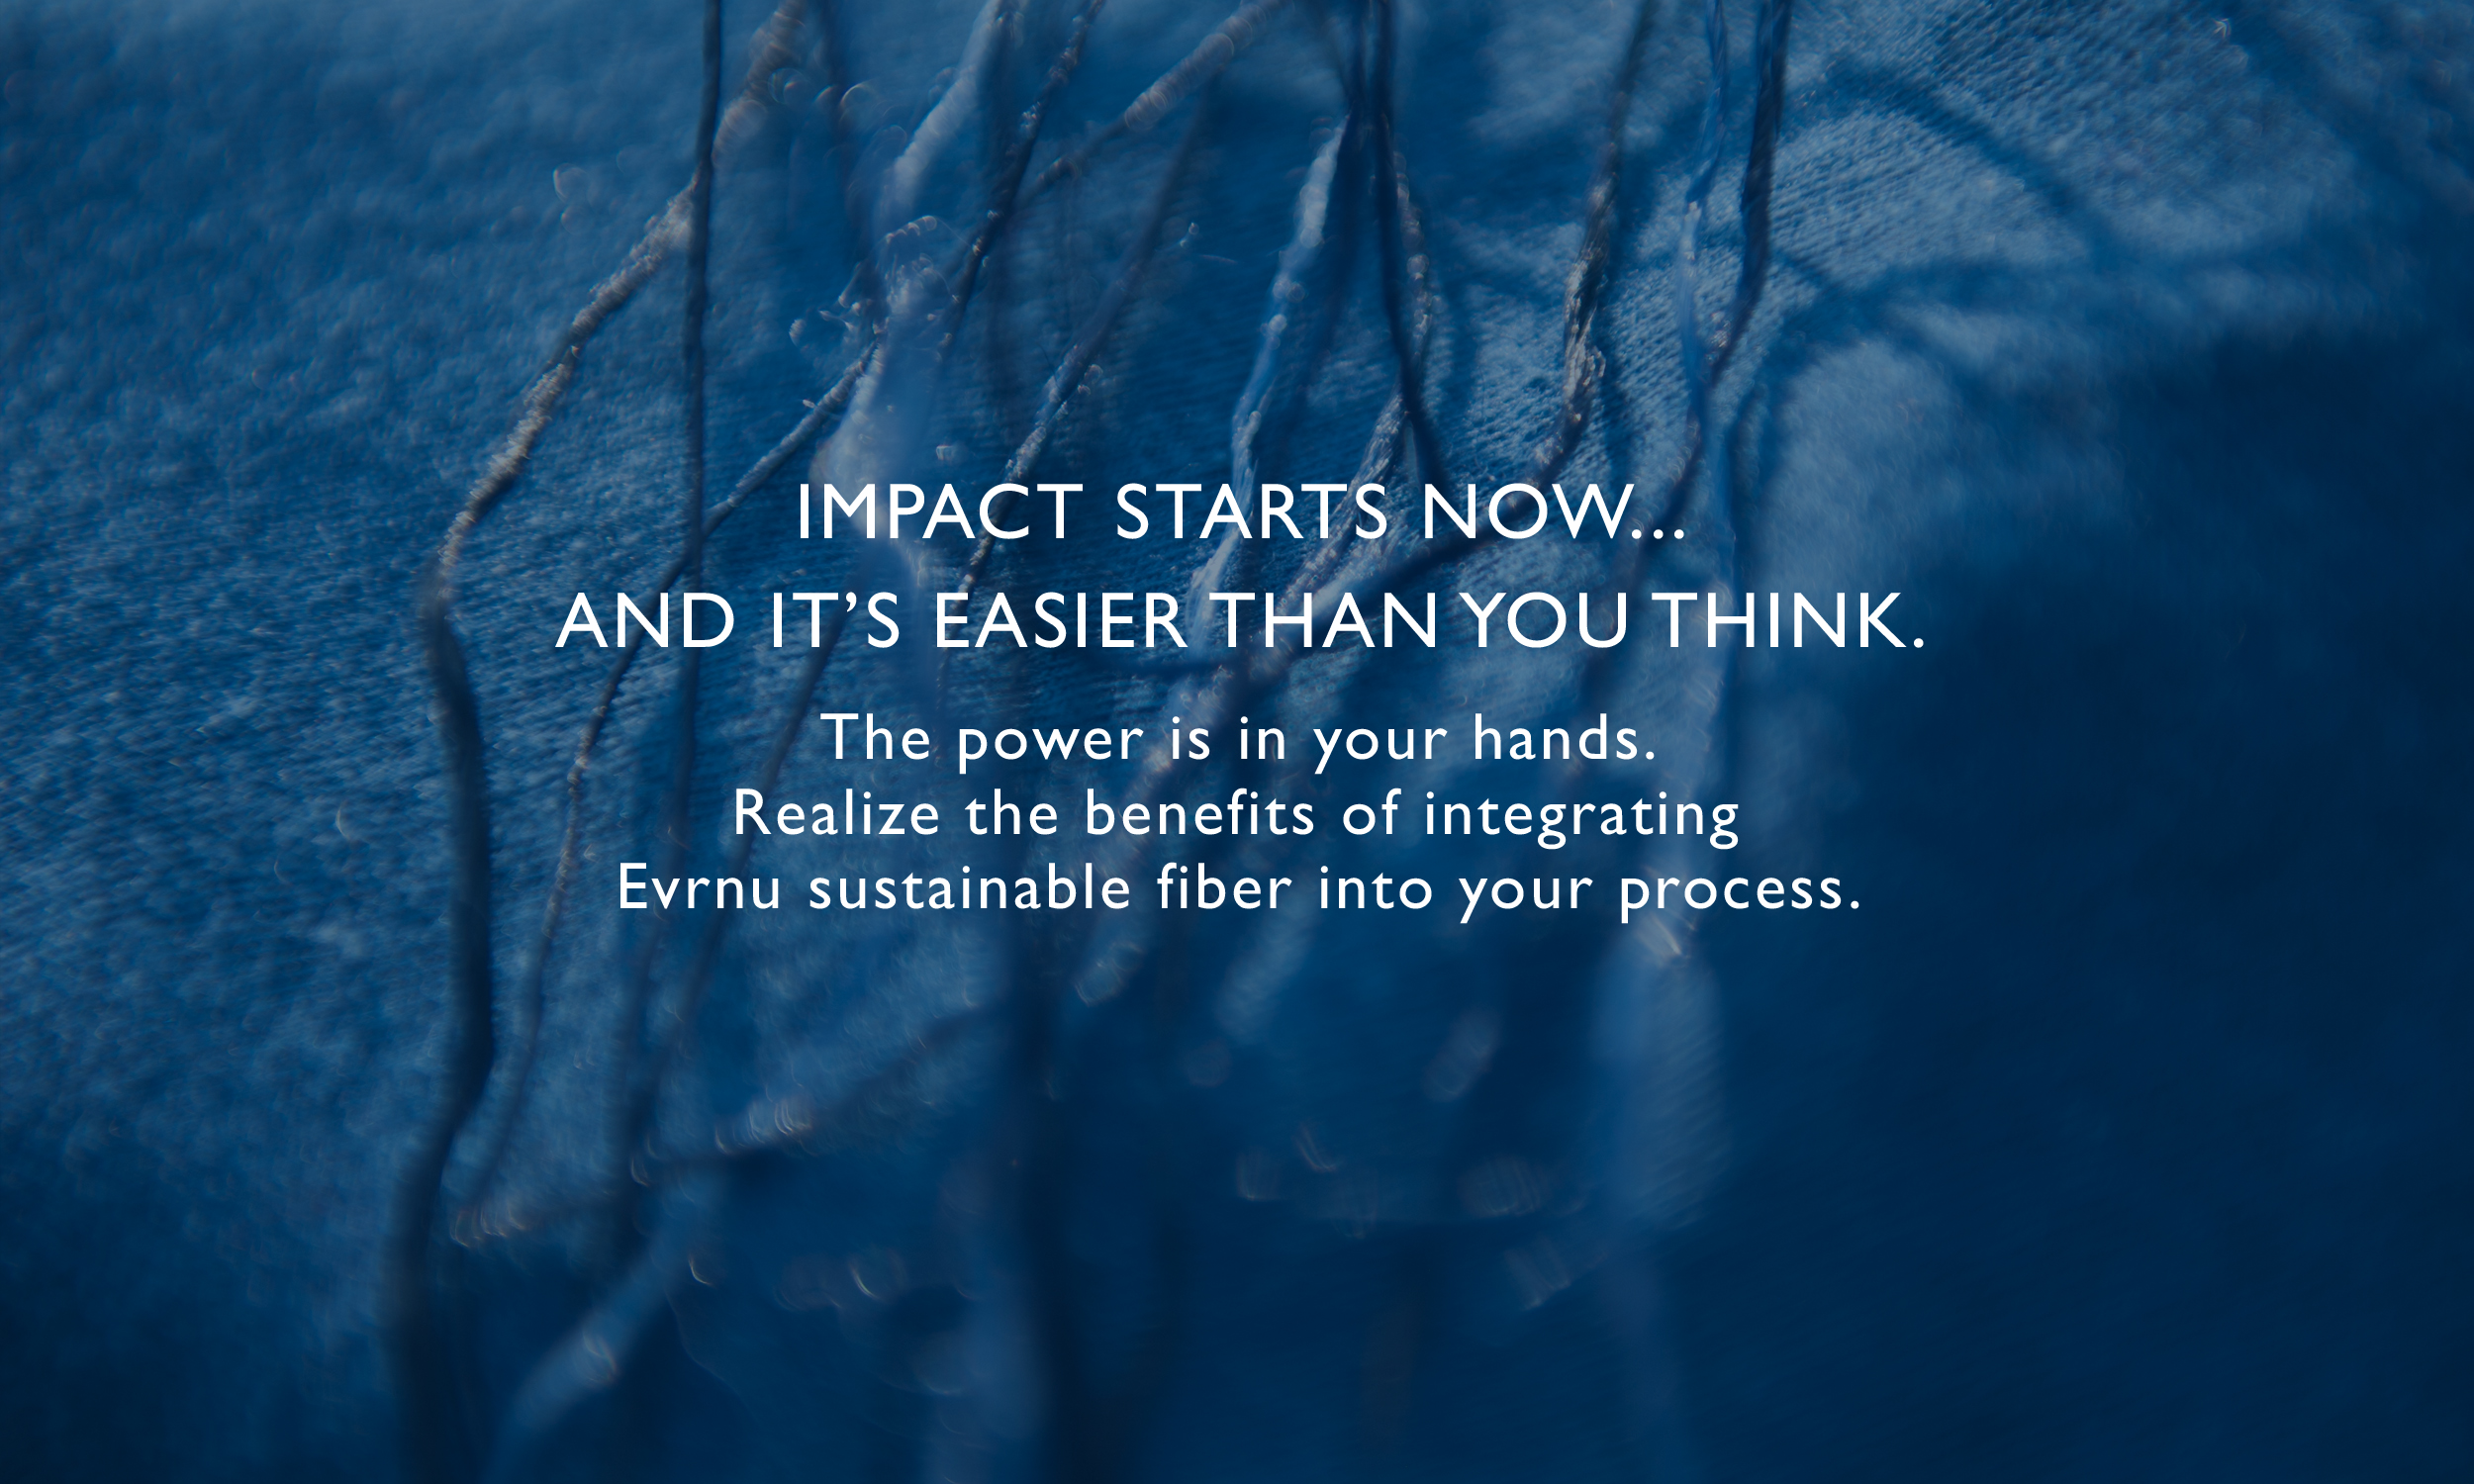 impact starts now.jpg